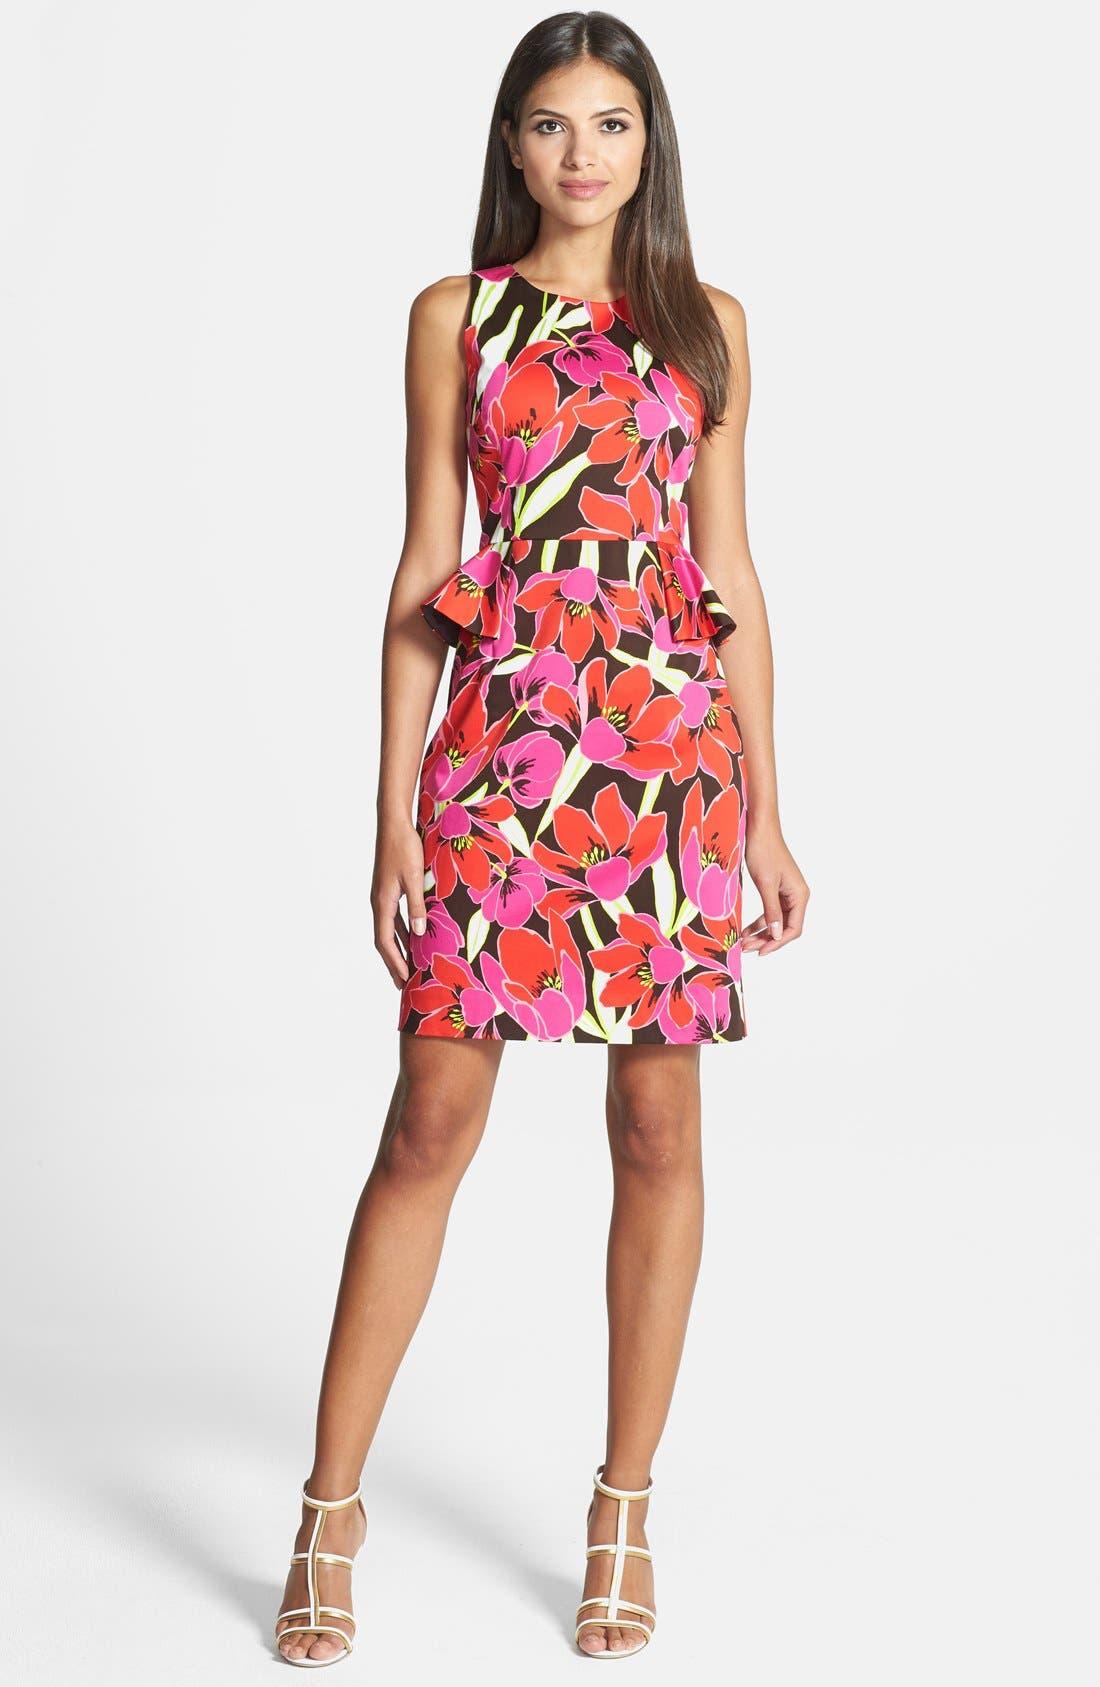 KATE SPADE NEW YORK,                             tropical print peplum sheath dress,                             Main thumbnail 1, color,                             650